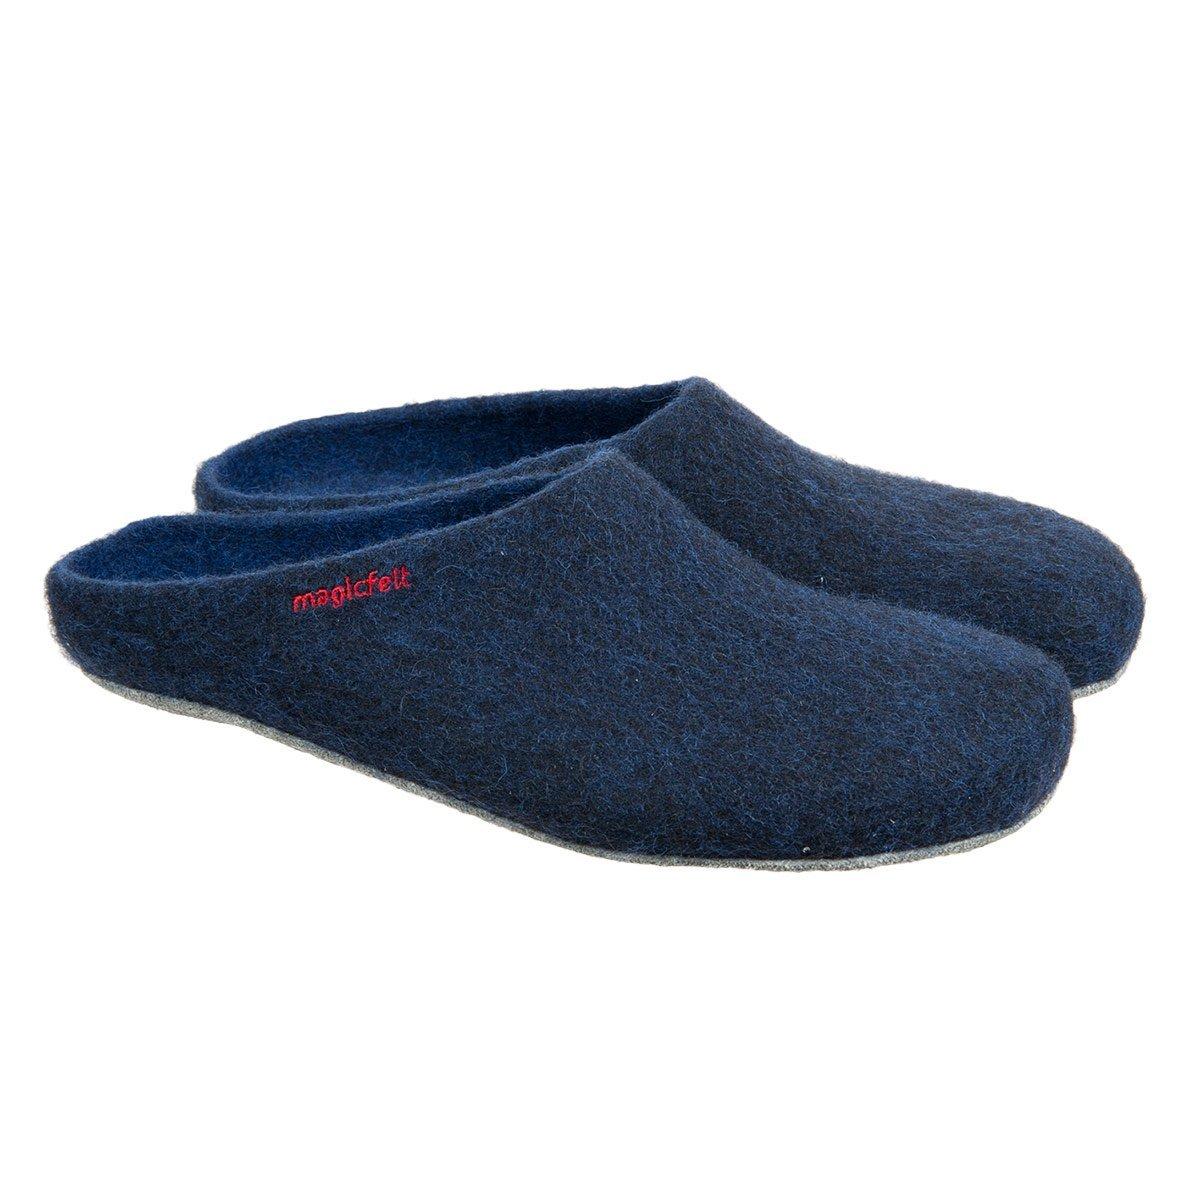 0e0c33a8ccefa House shoes trendy felt, with light sole leather